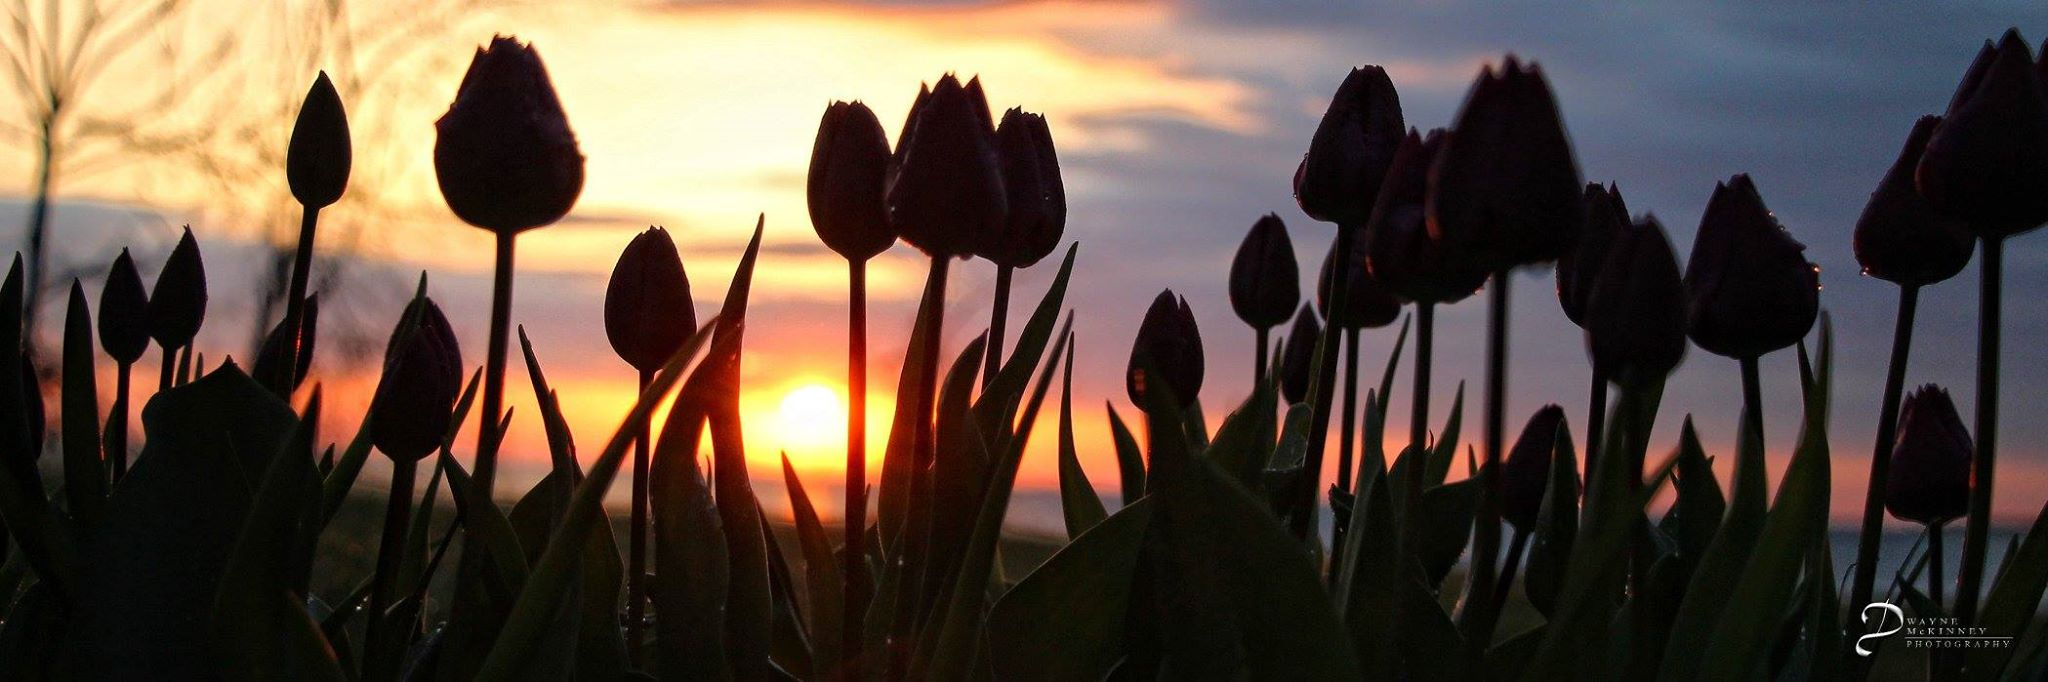 logo tulips.jpg